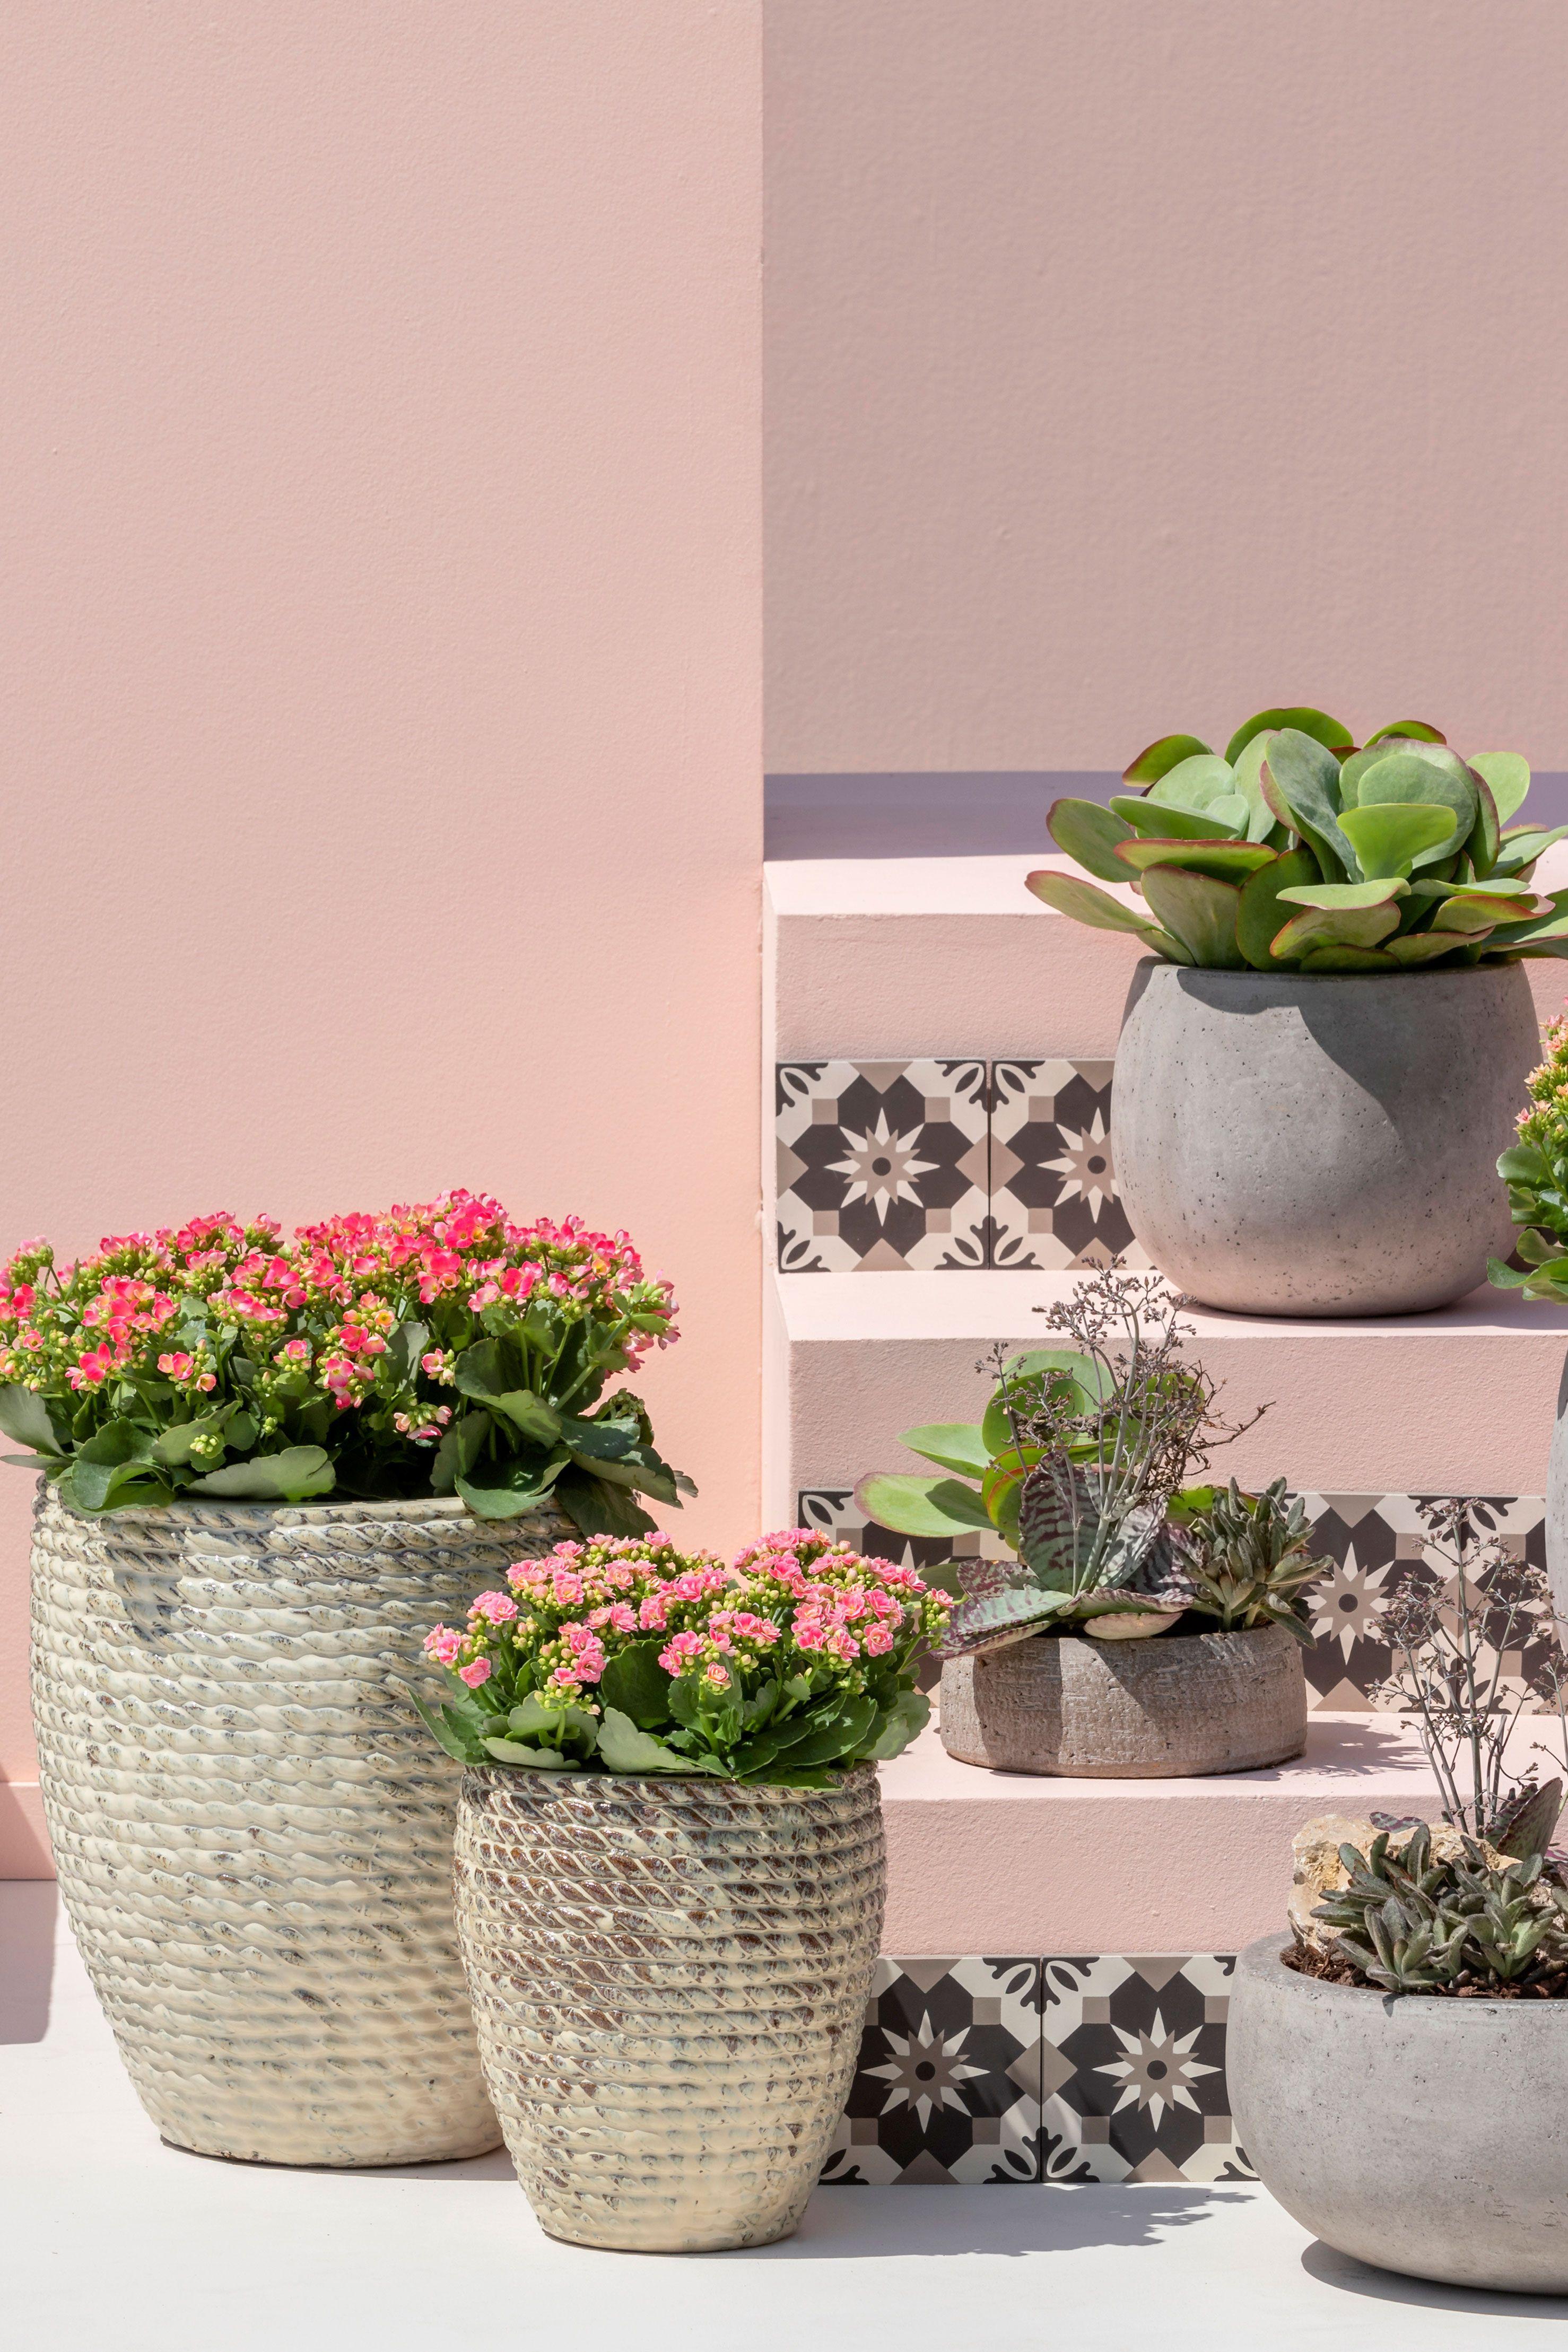 Kalanchoen Pflanzen Dauerbluher Zimmerpflanzen